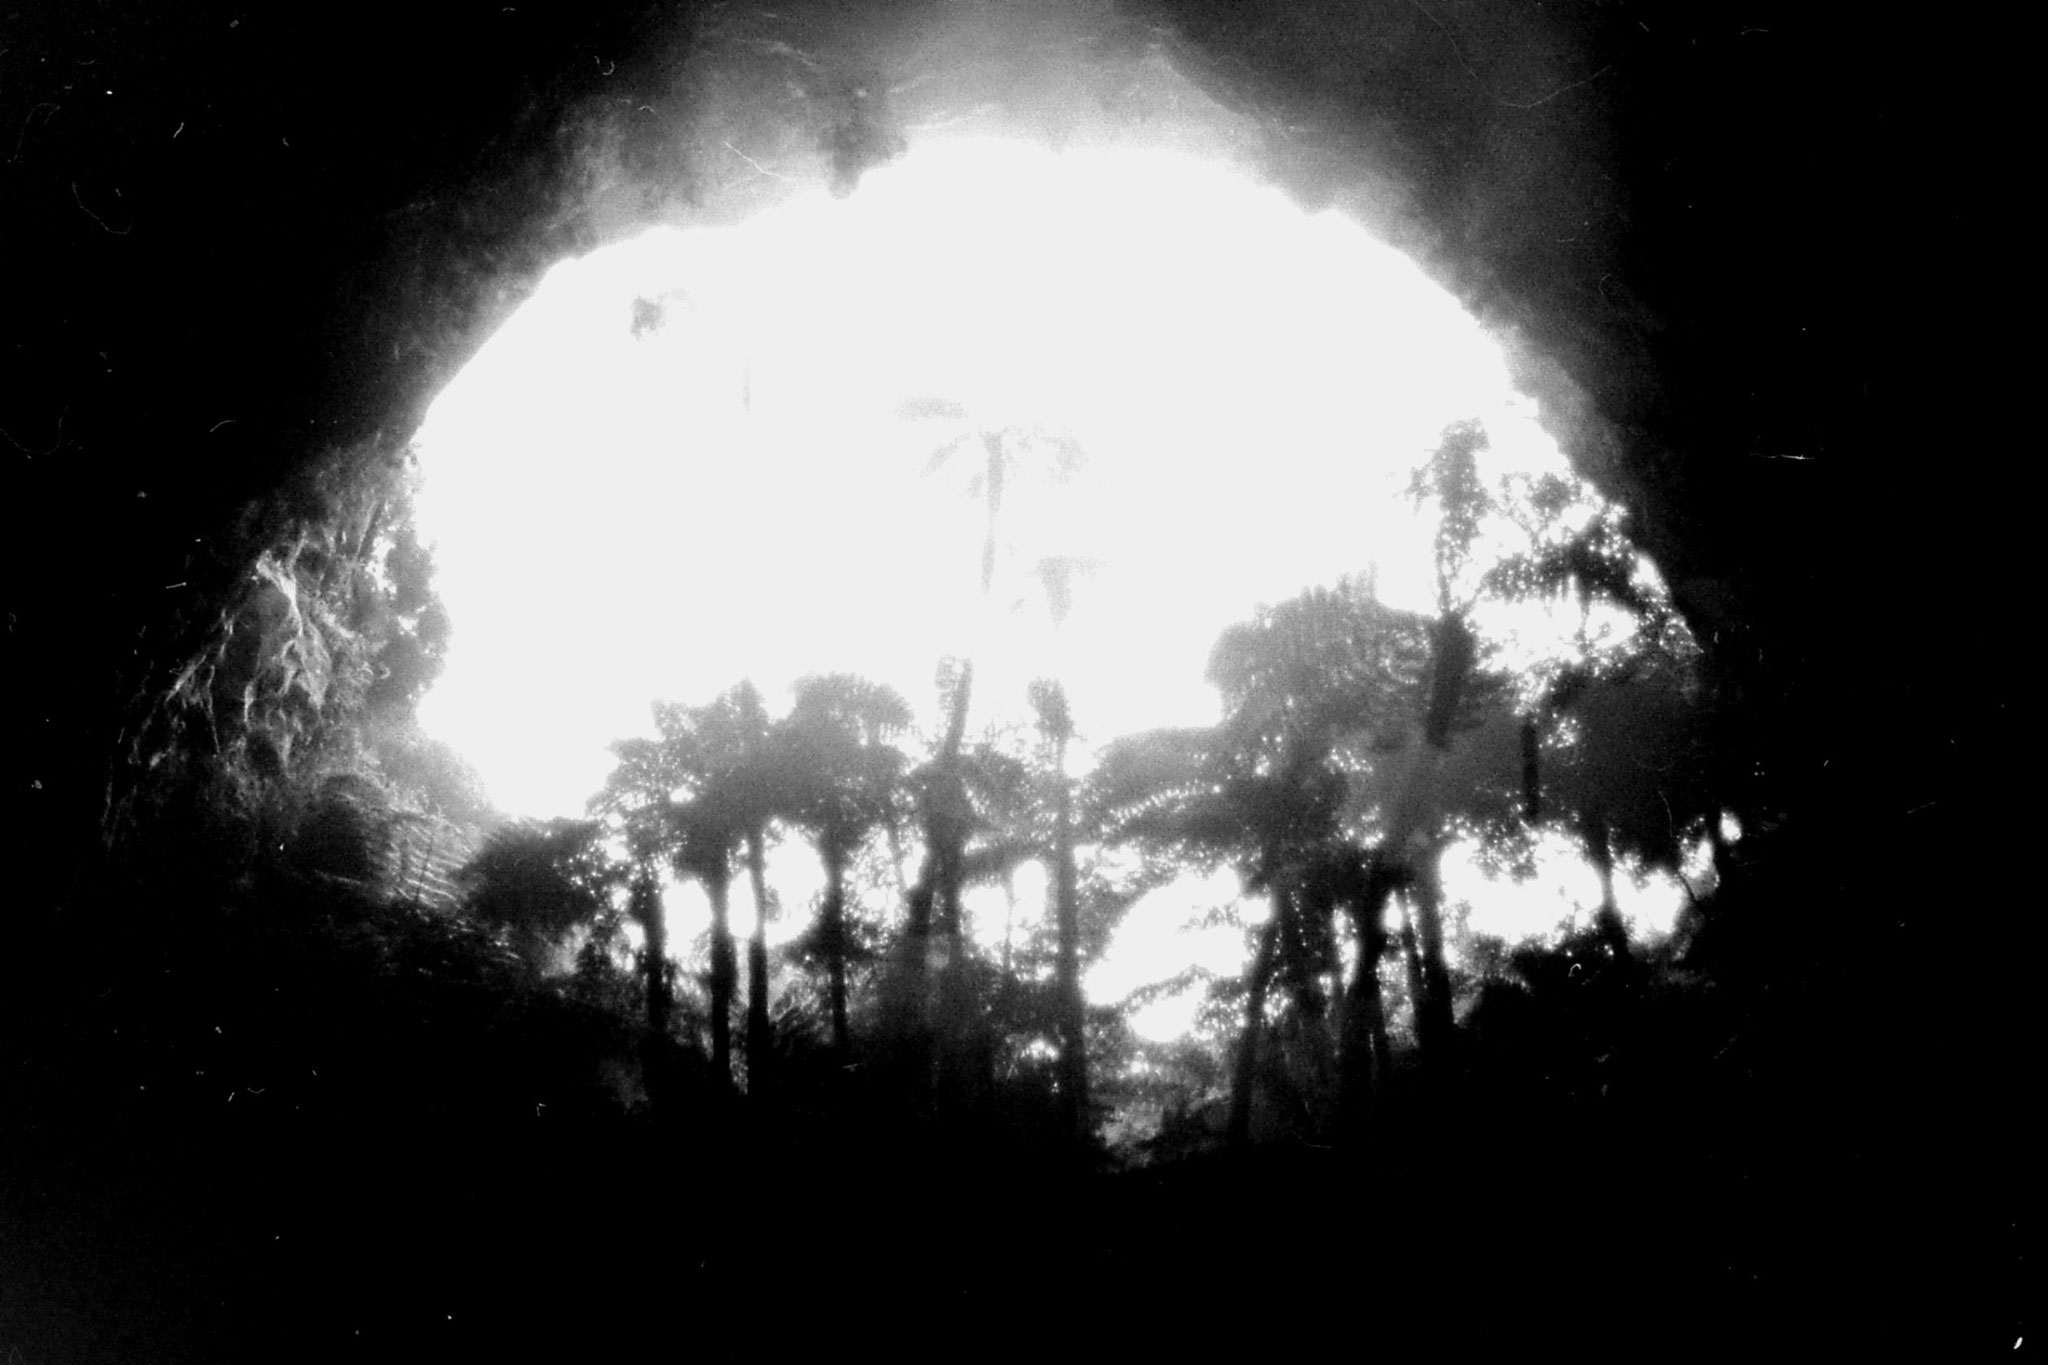 31/8/1990: 6: Orakeikorako opening of Ruatapu Cave